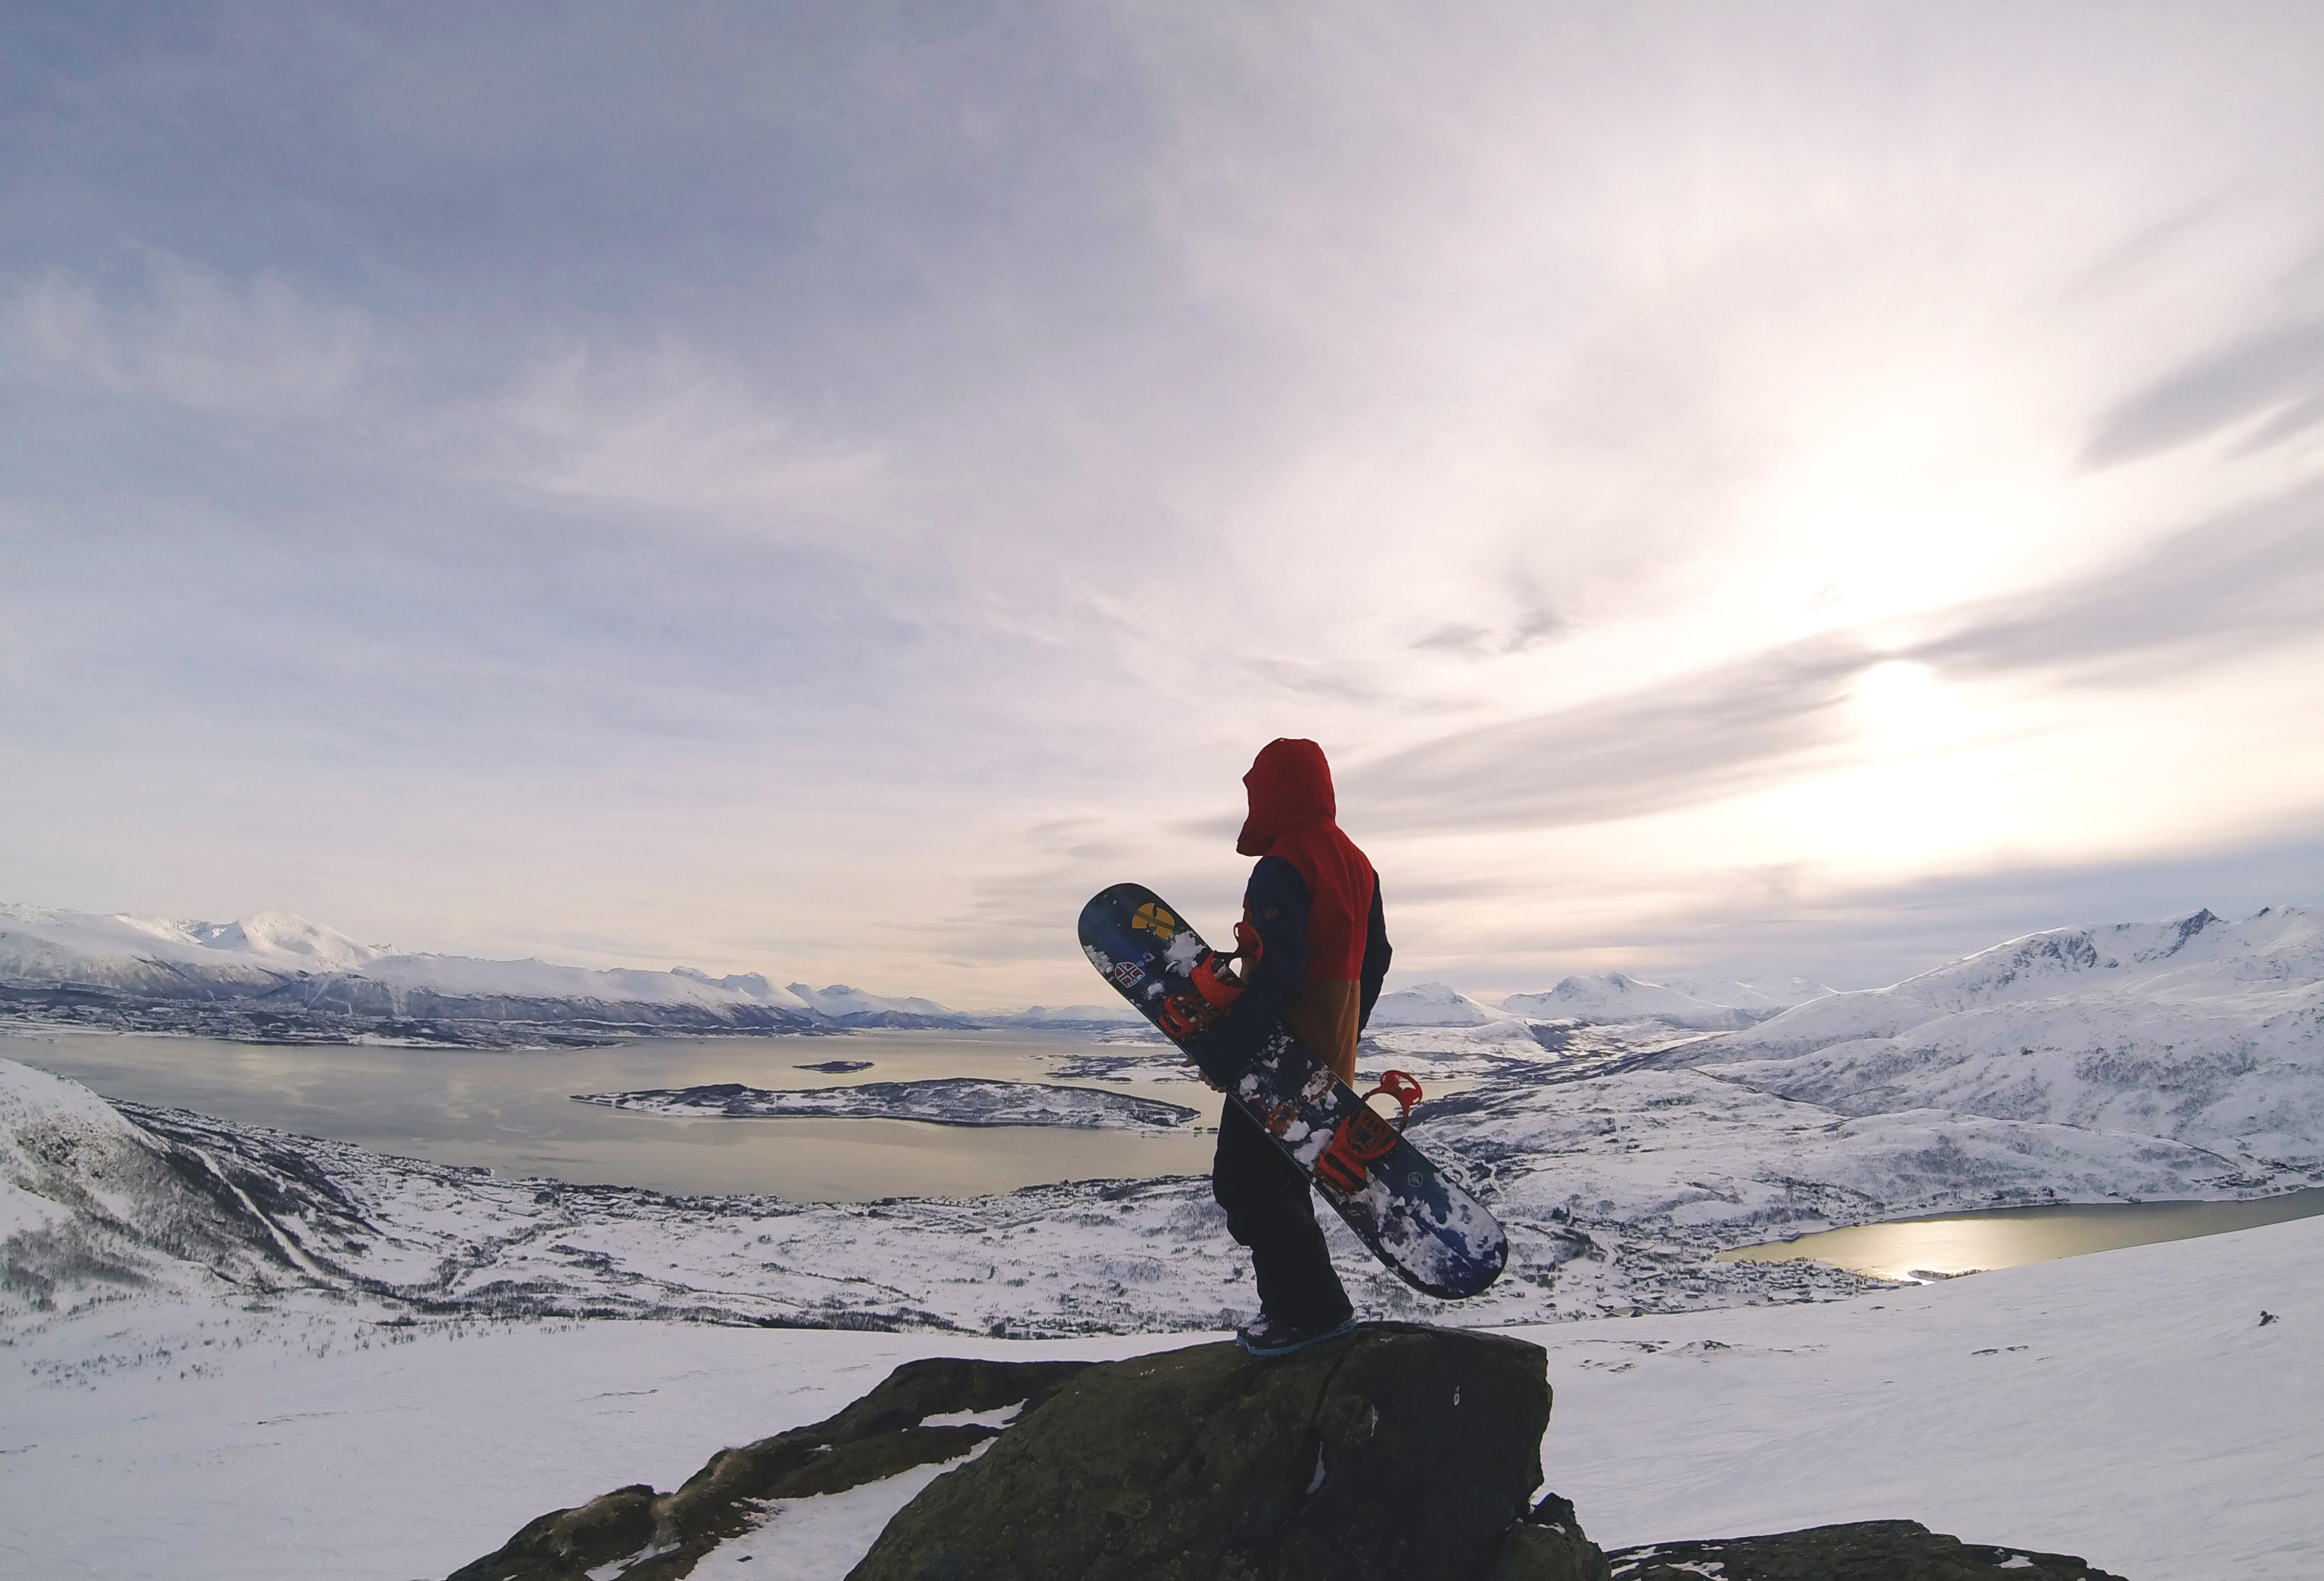 overlooking the Tromsø region prior to descent.